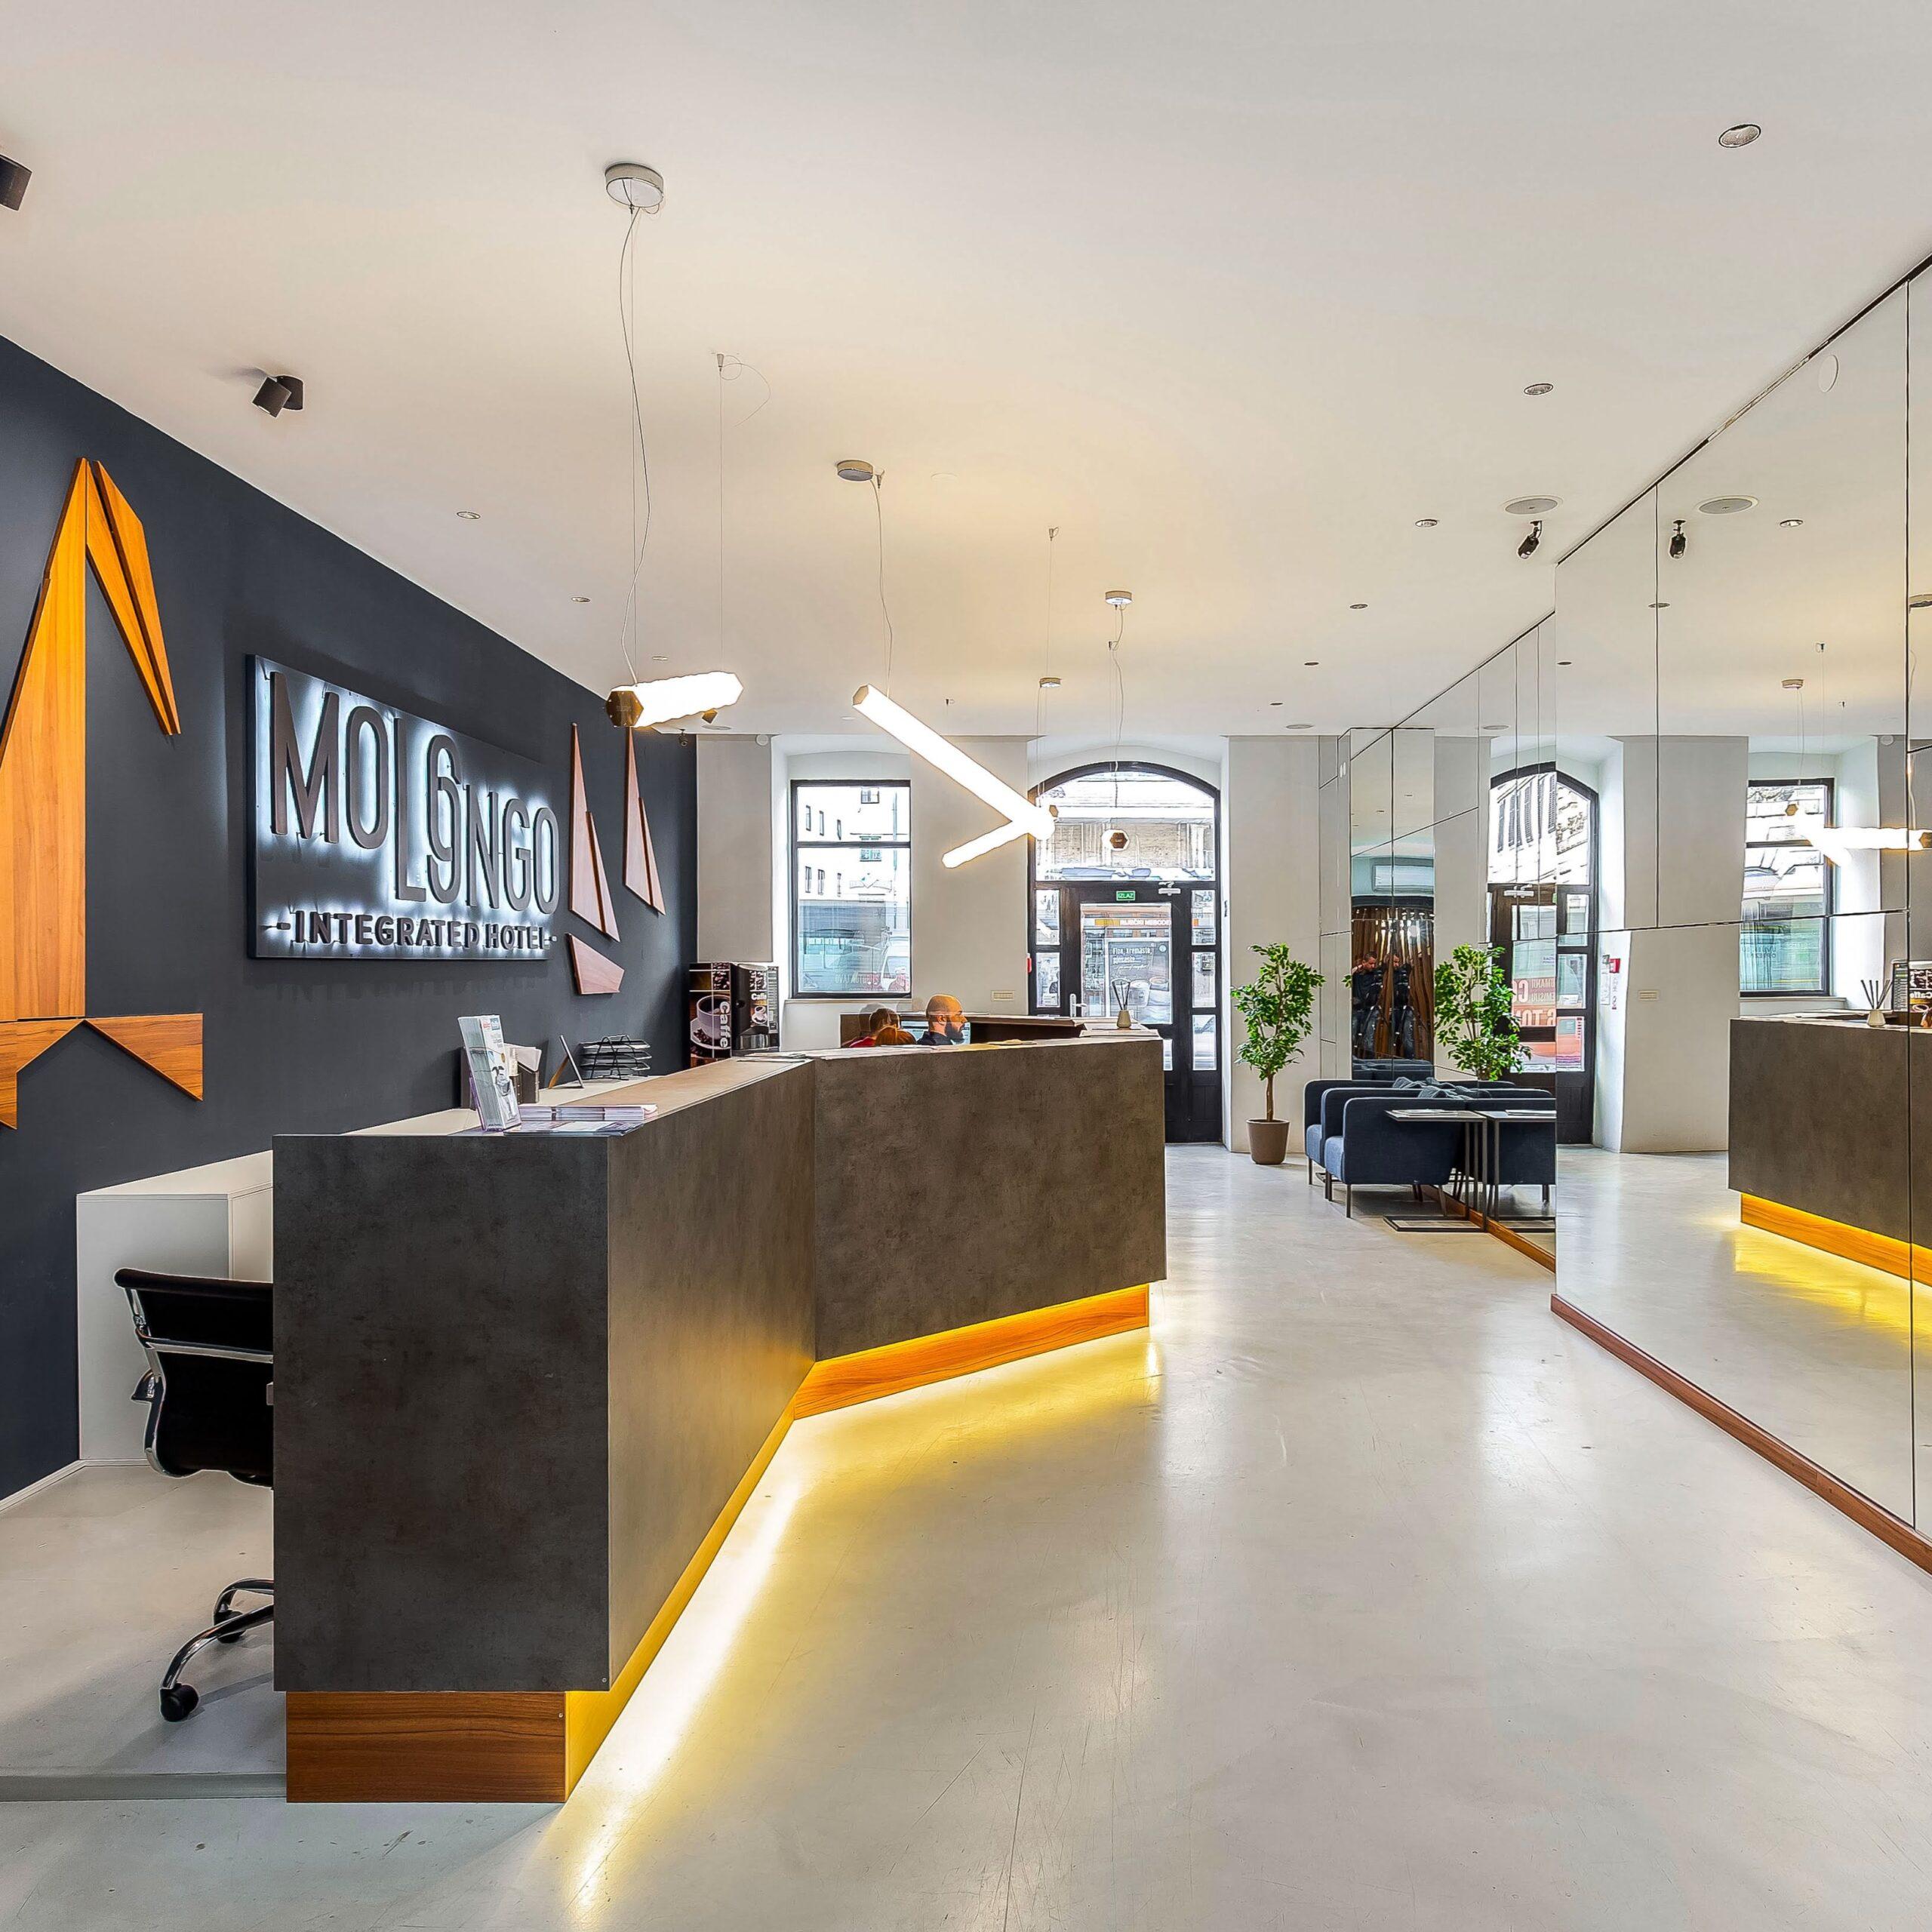 Molo Longo integrated hotel